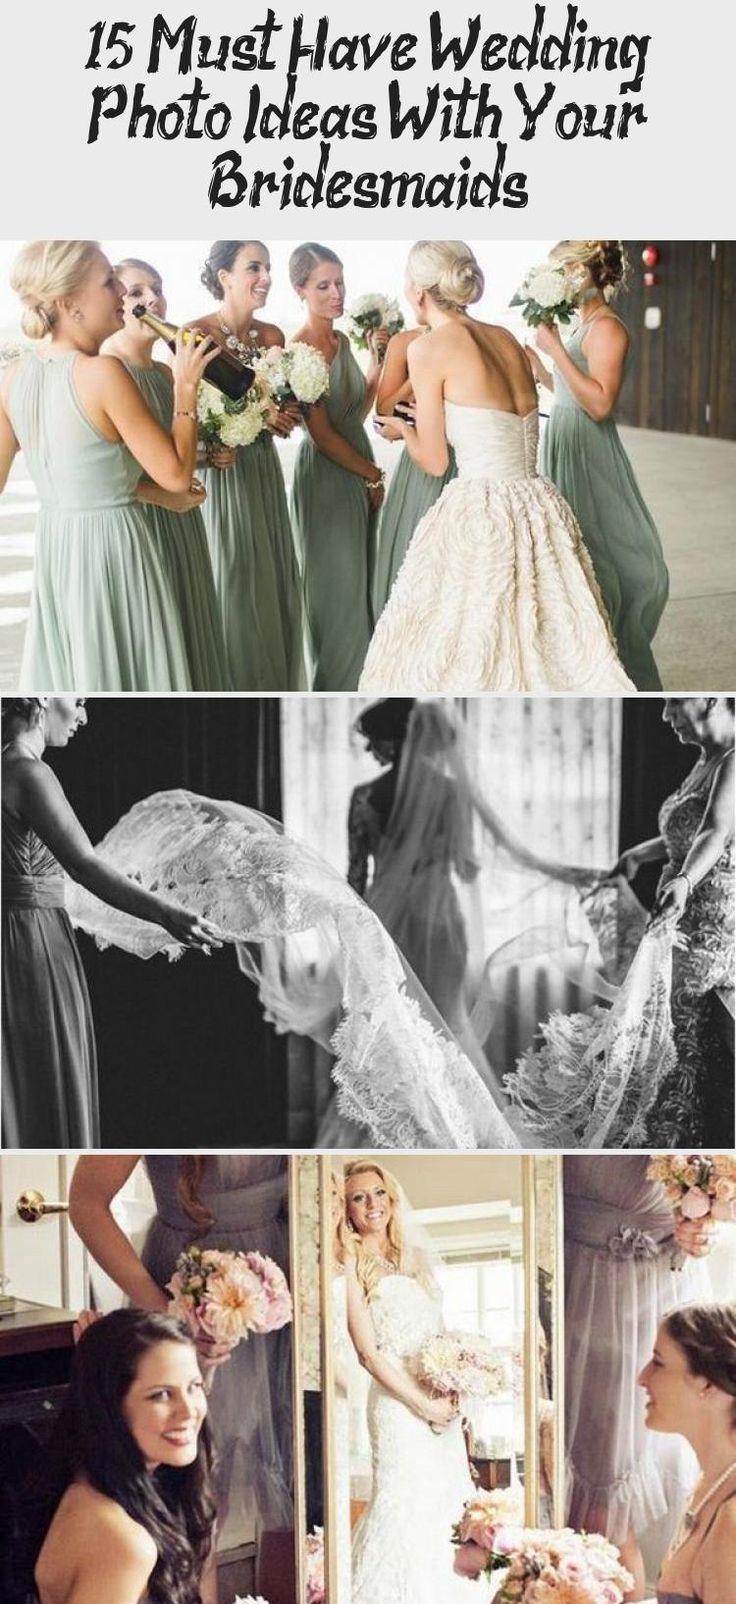 neutral colored bridesmaid dresses